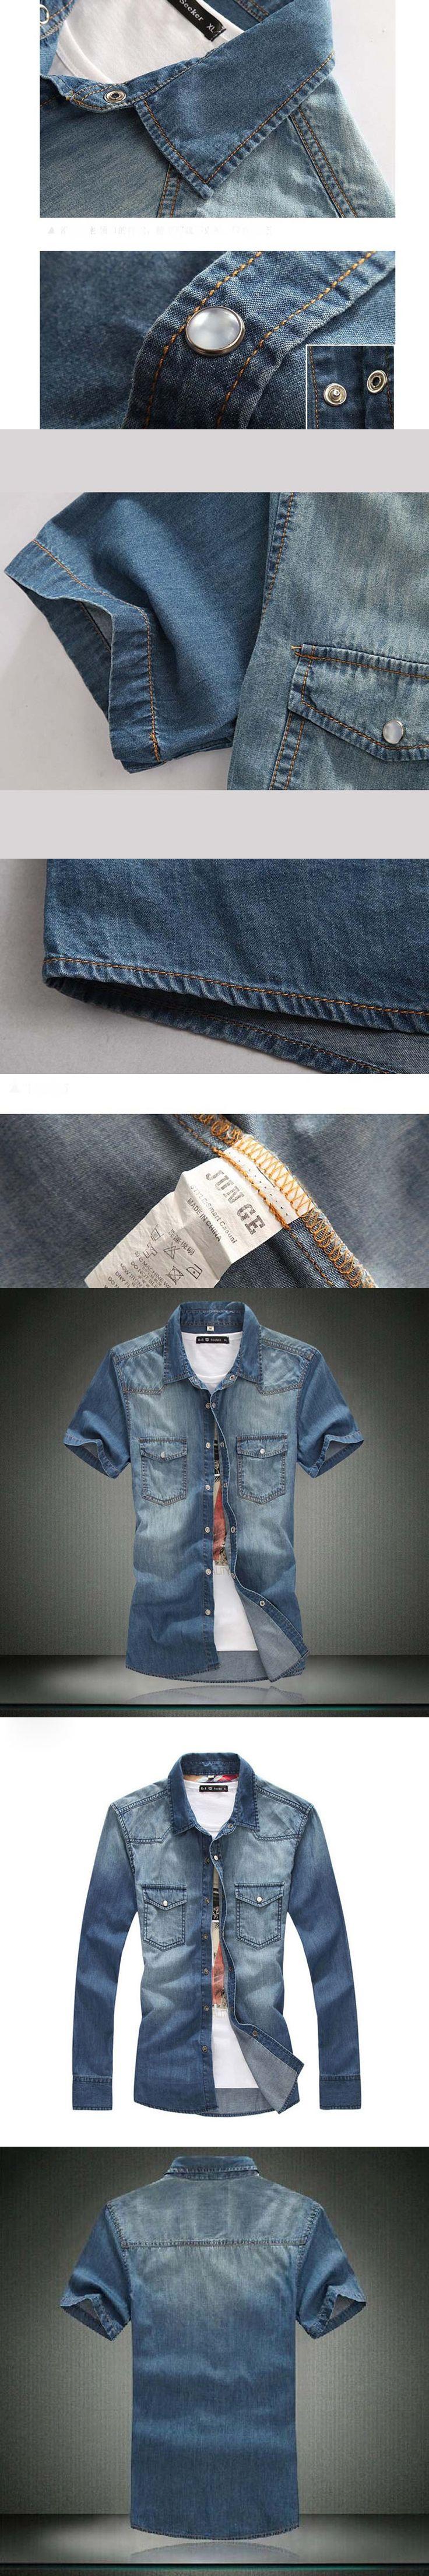 Plus Size 4XL 5XL Man Brand Clothing New Tops Fashion Summer Style cotton denim shirts masculina camisa shirt men chemise homme